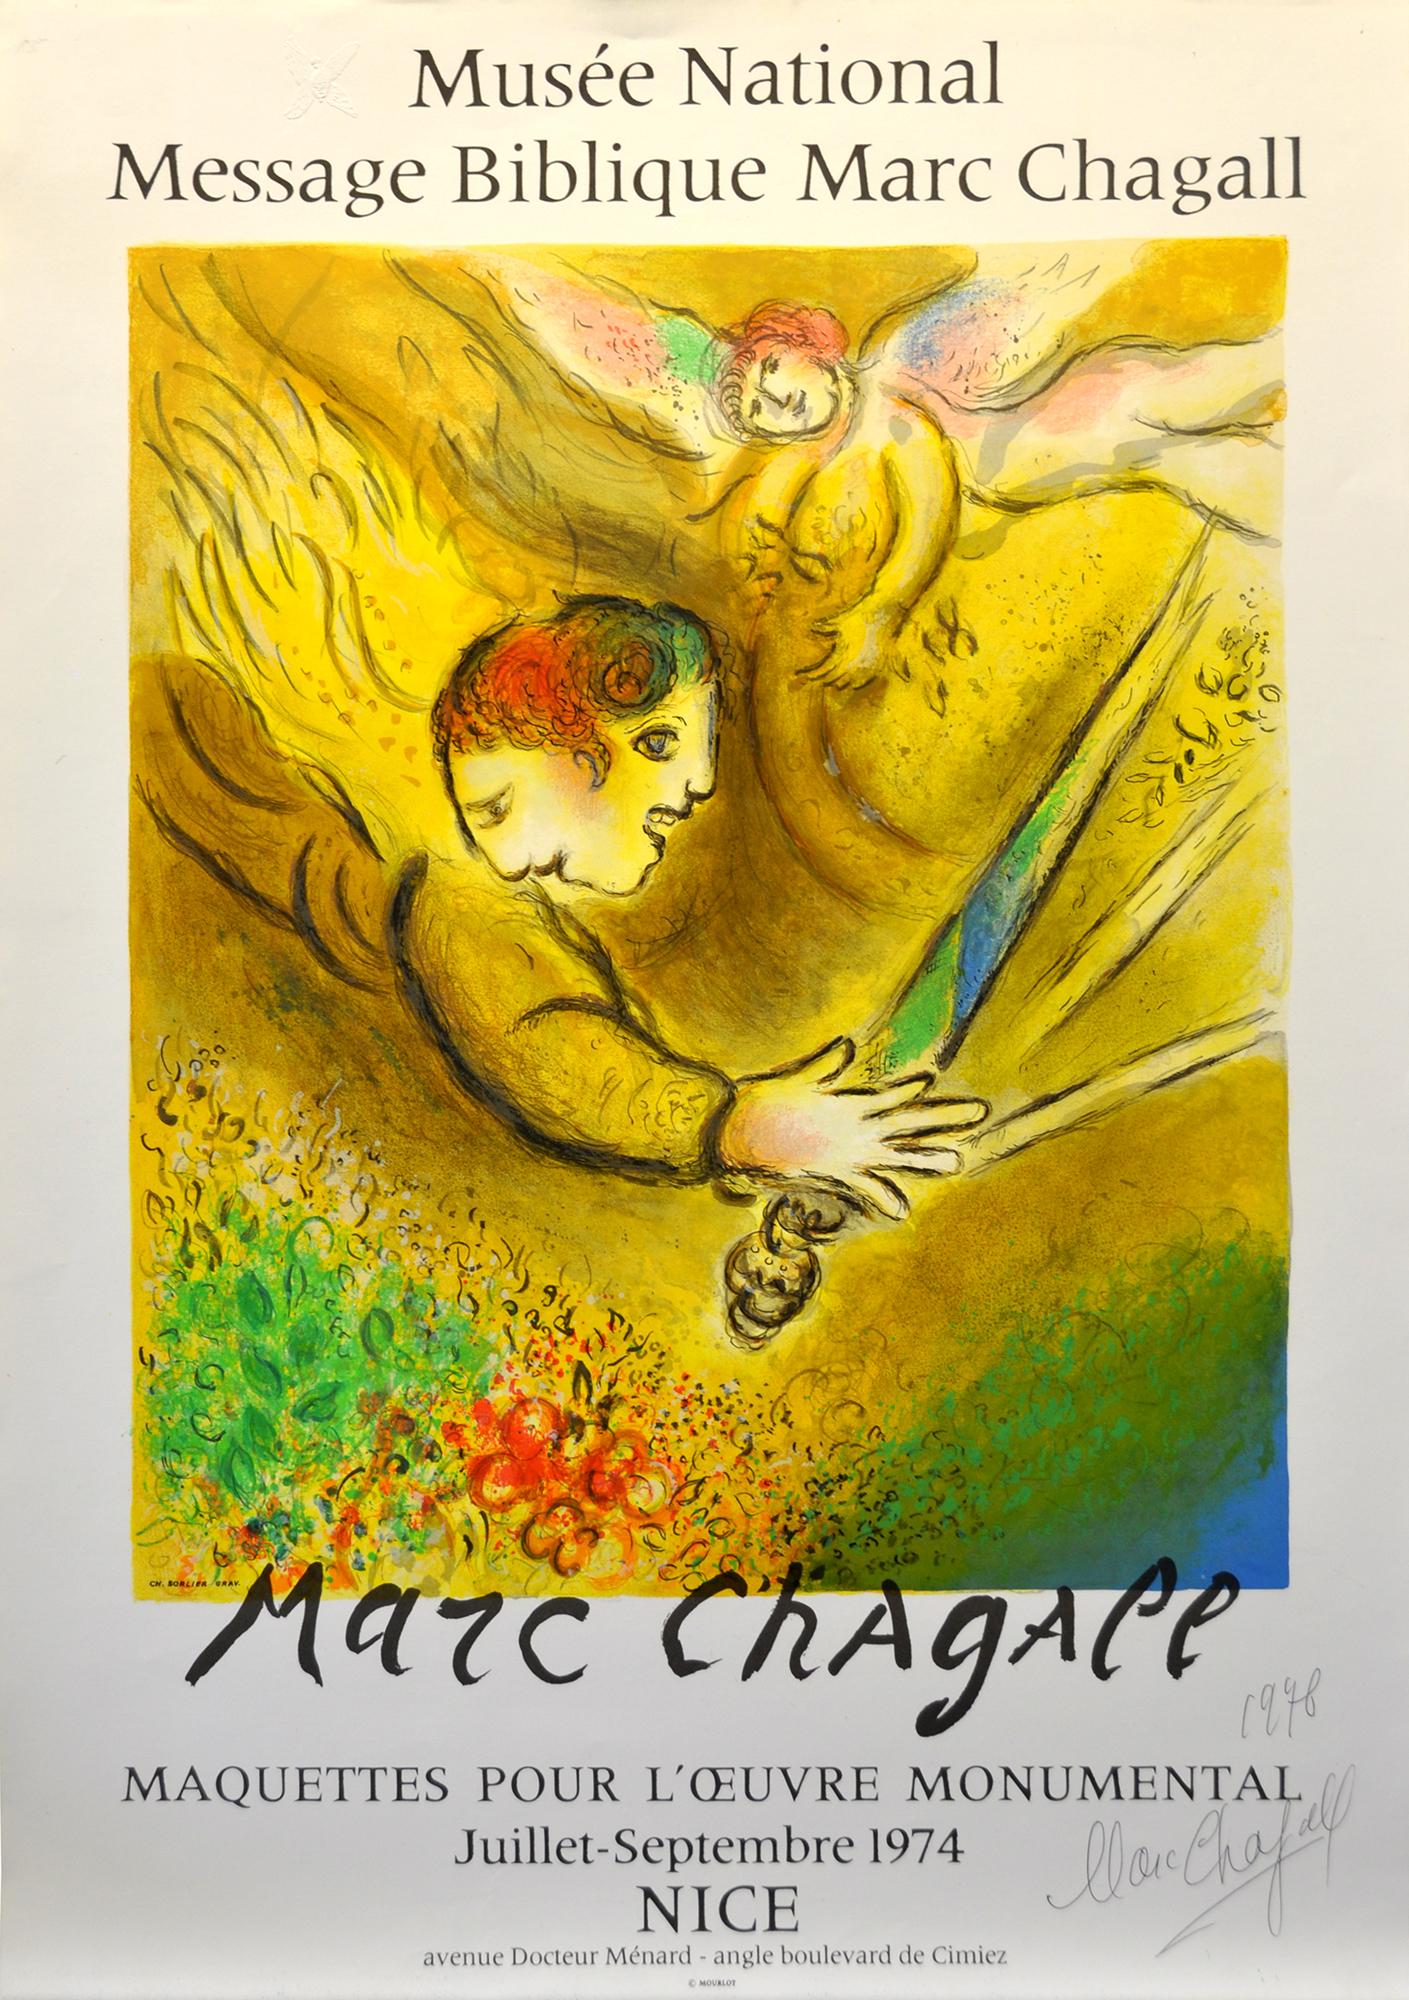 Marc Chagall - L'ange du jugement , 0610-008-417